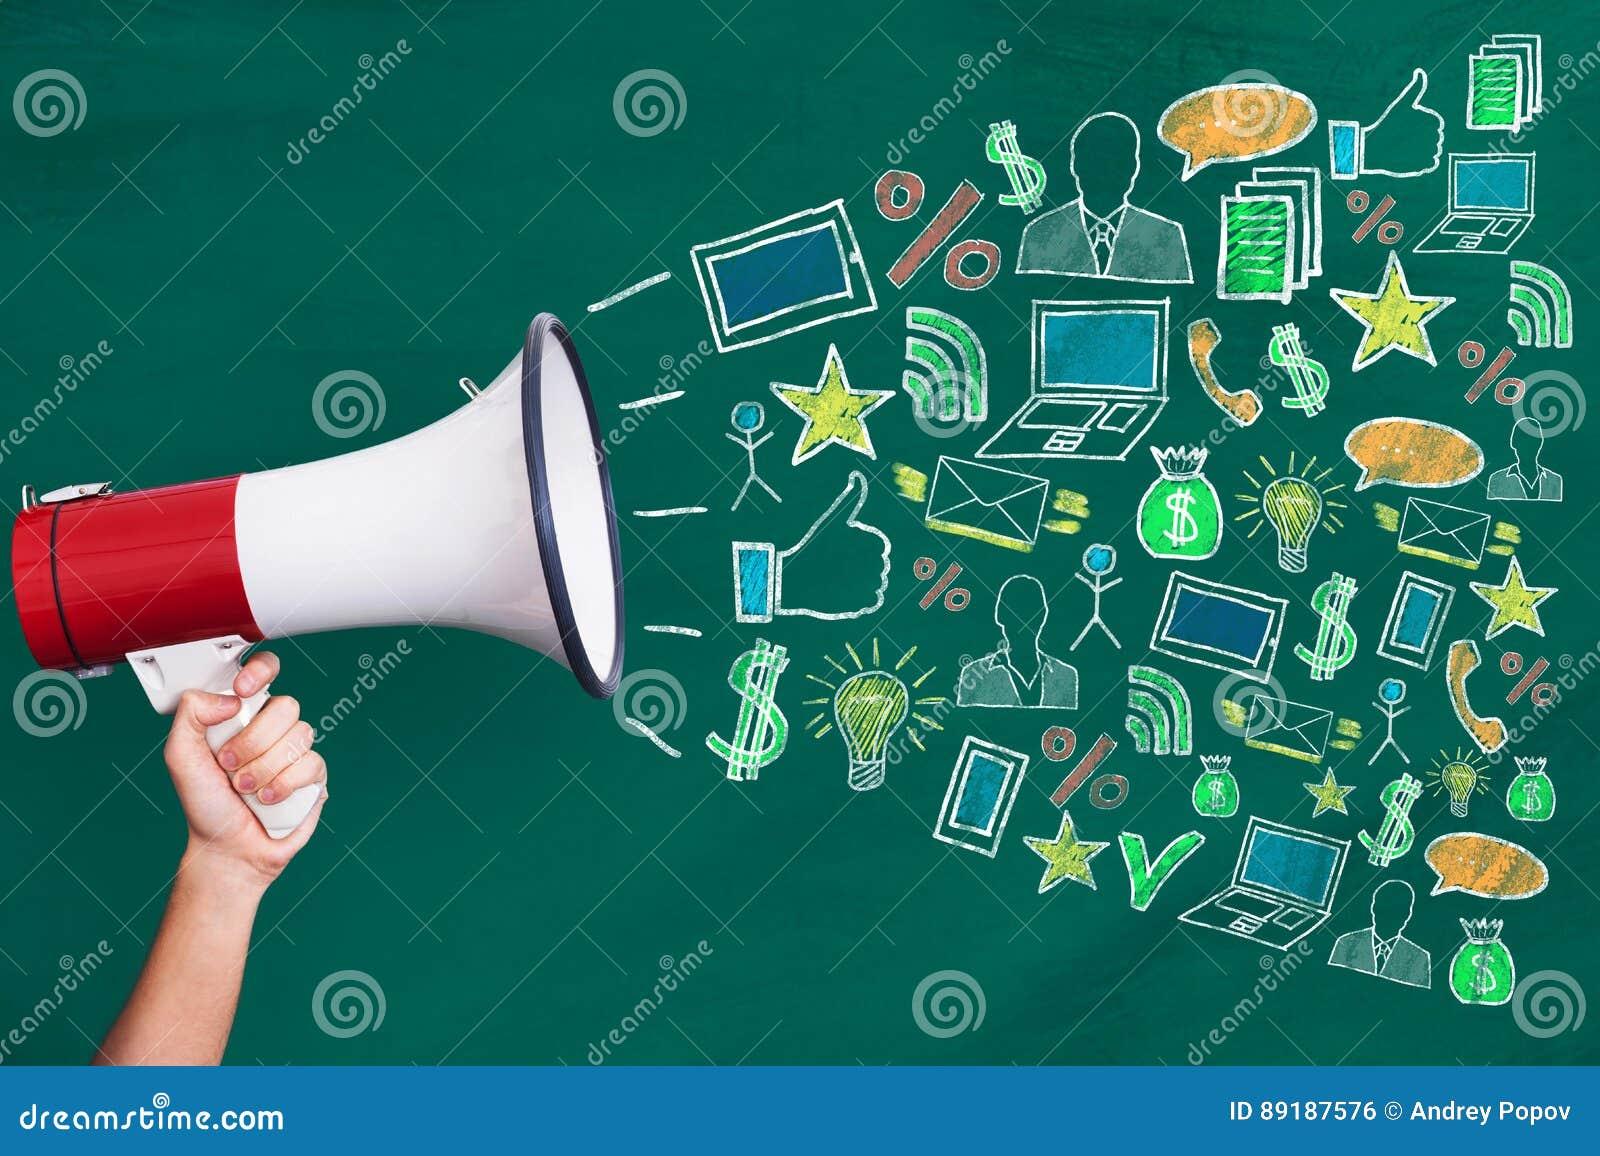 Megaphon mit Digital-Marketing-Konzept